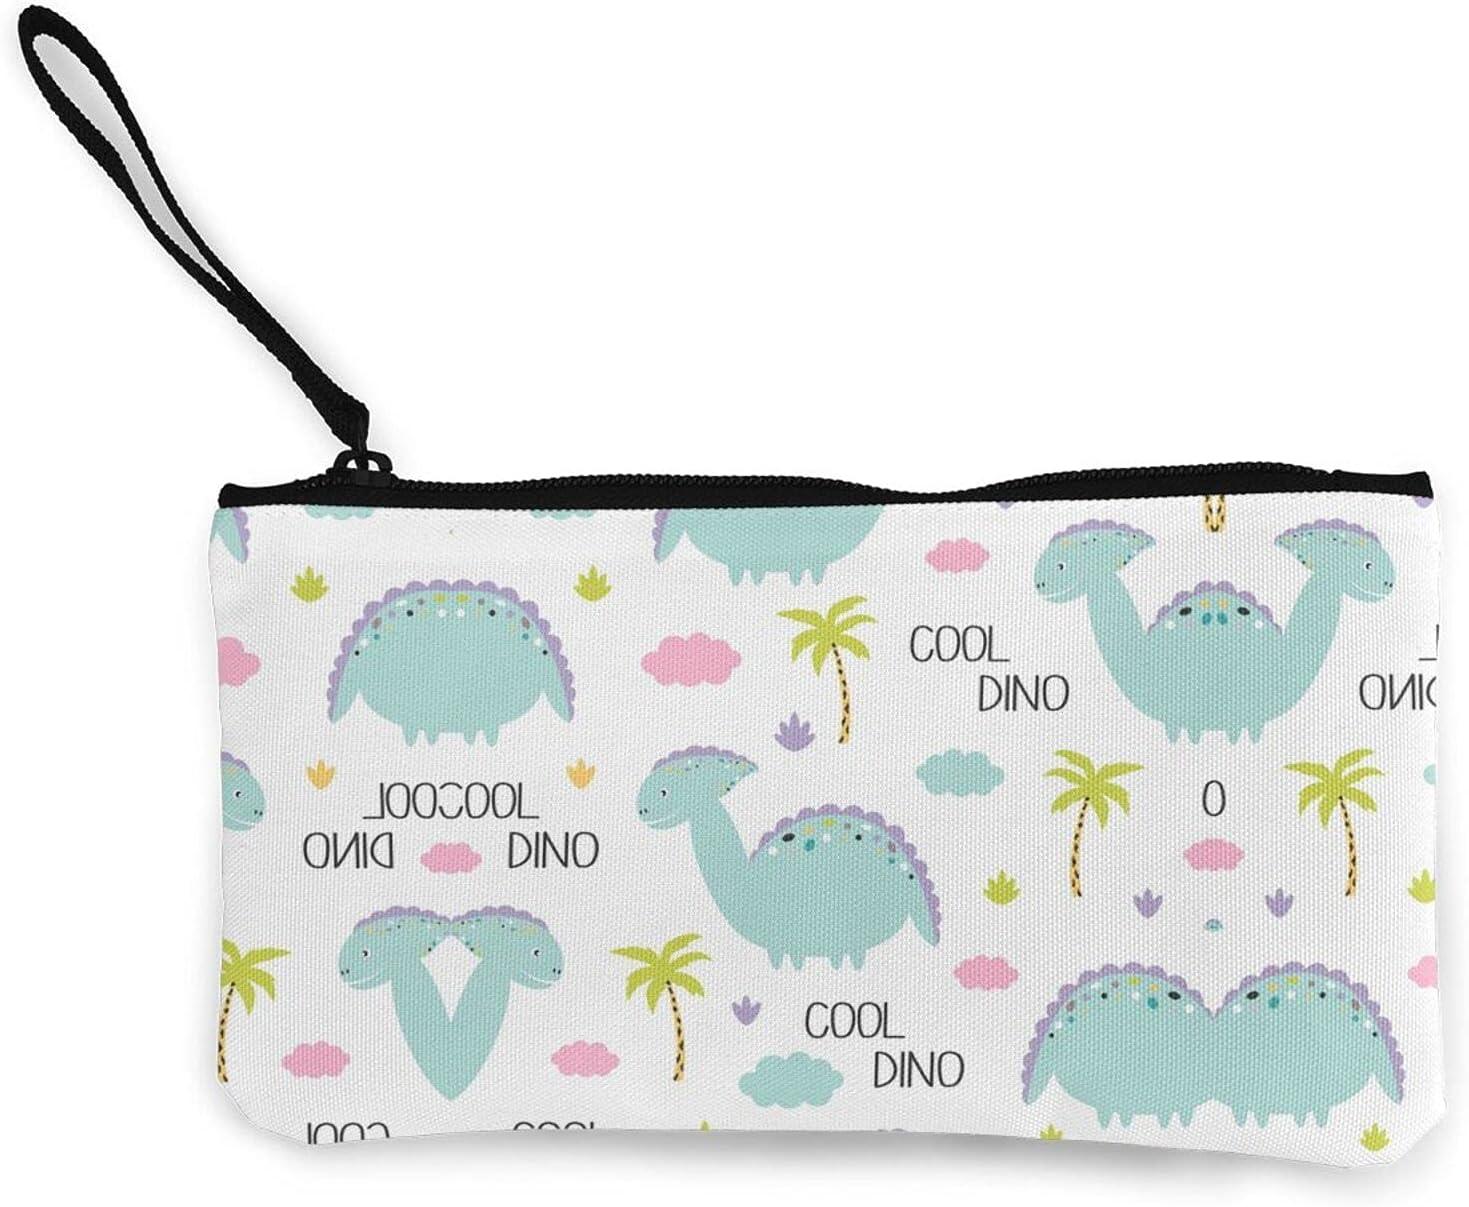 Cute Dino Dinosaurs Zipper Pouch/ Canvas Coin Purse Wallet/ Cute Mini Change Wallet For Women/ Pouch Card Holder Phone Storage Bag